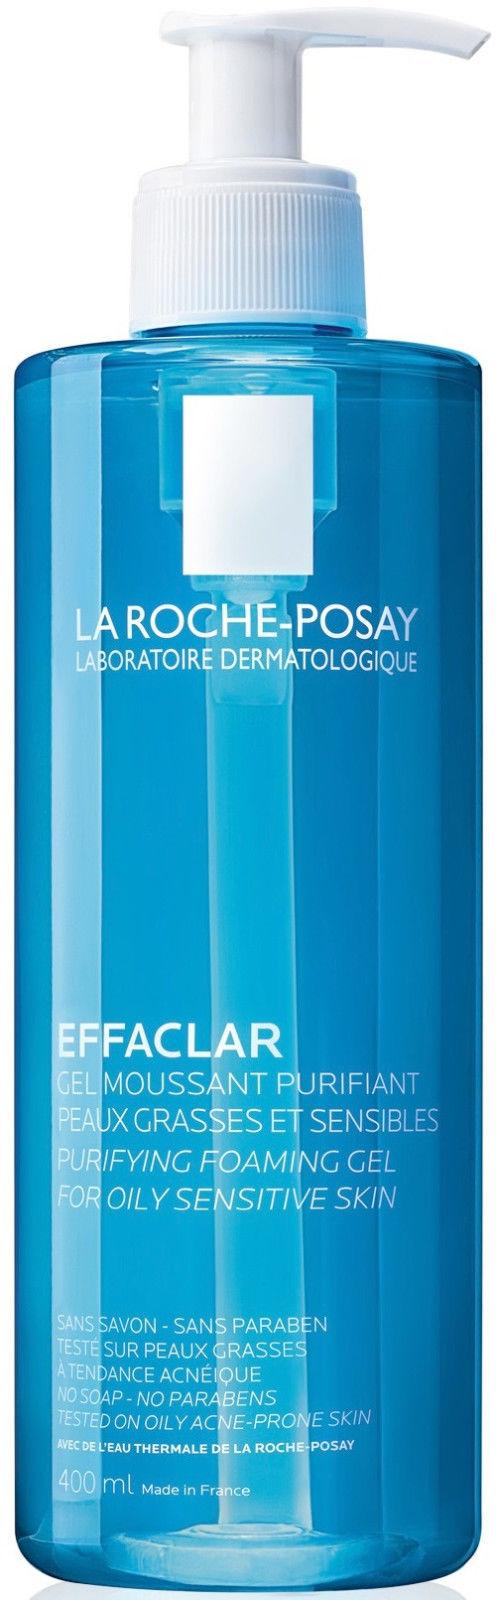 La Roche Posay Effaclar Purifying Foaming Gel For Oily Sensitive Skin 400ml for sale  USA